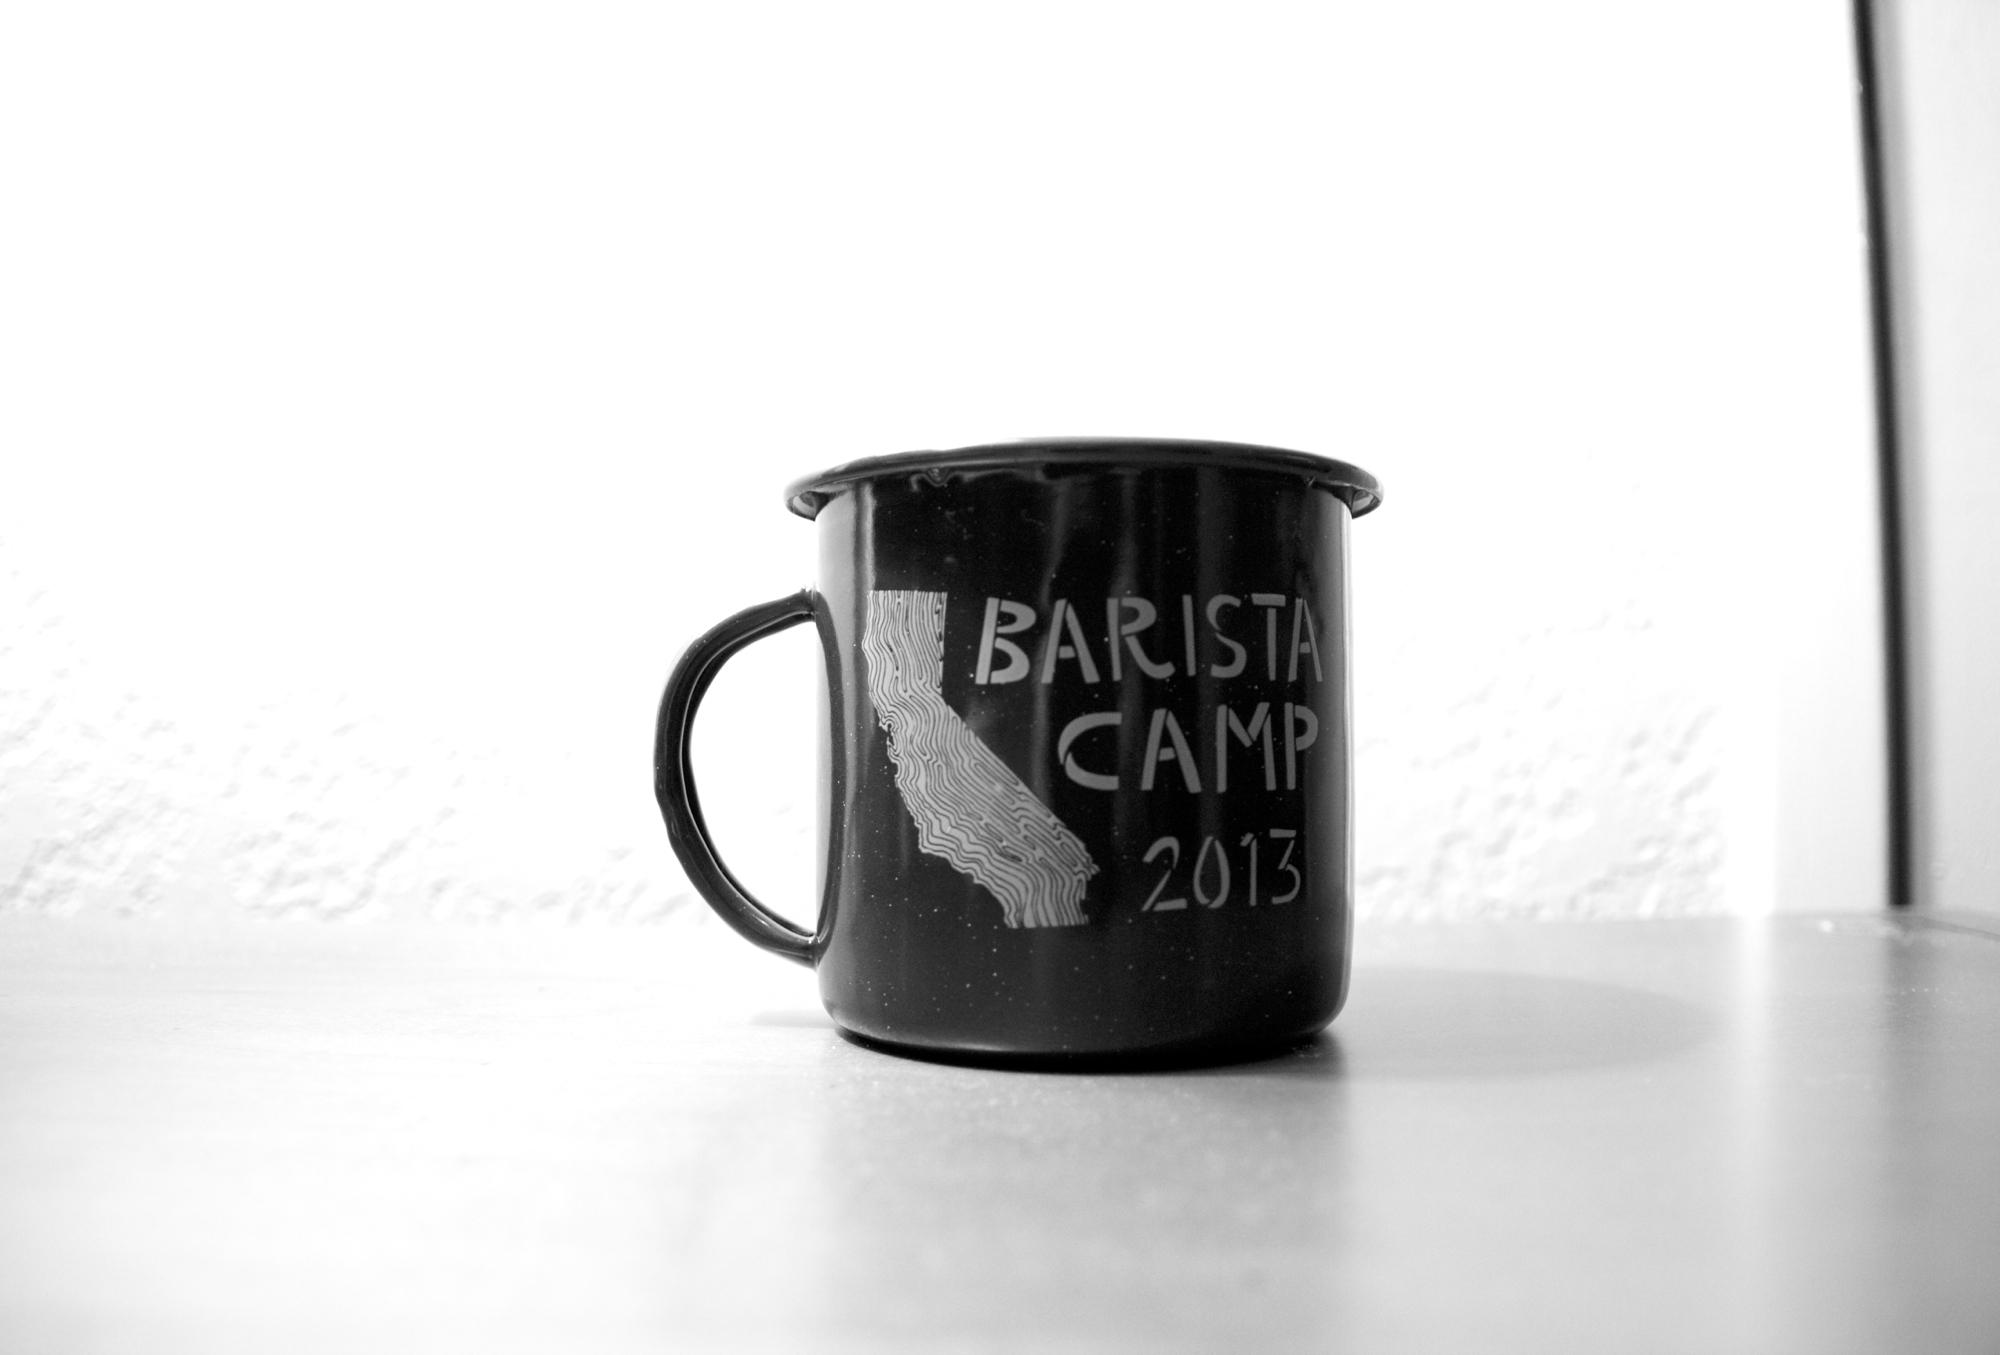 Verve Coffee Roasters swag, Barista Camp 2013.